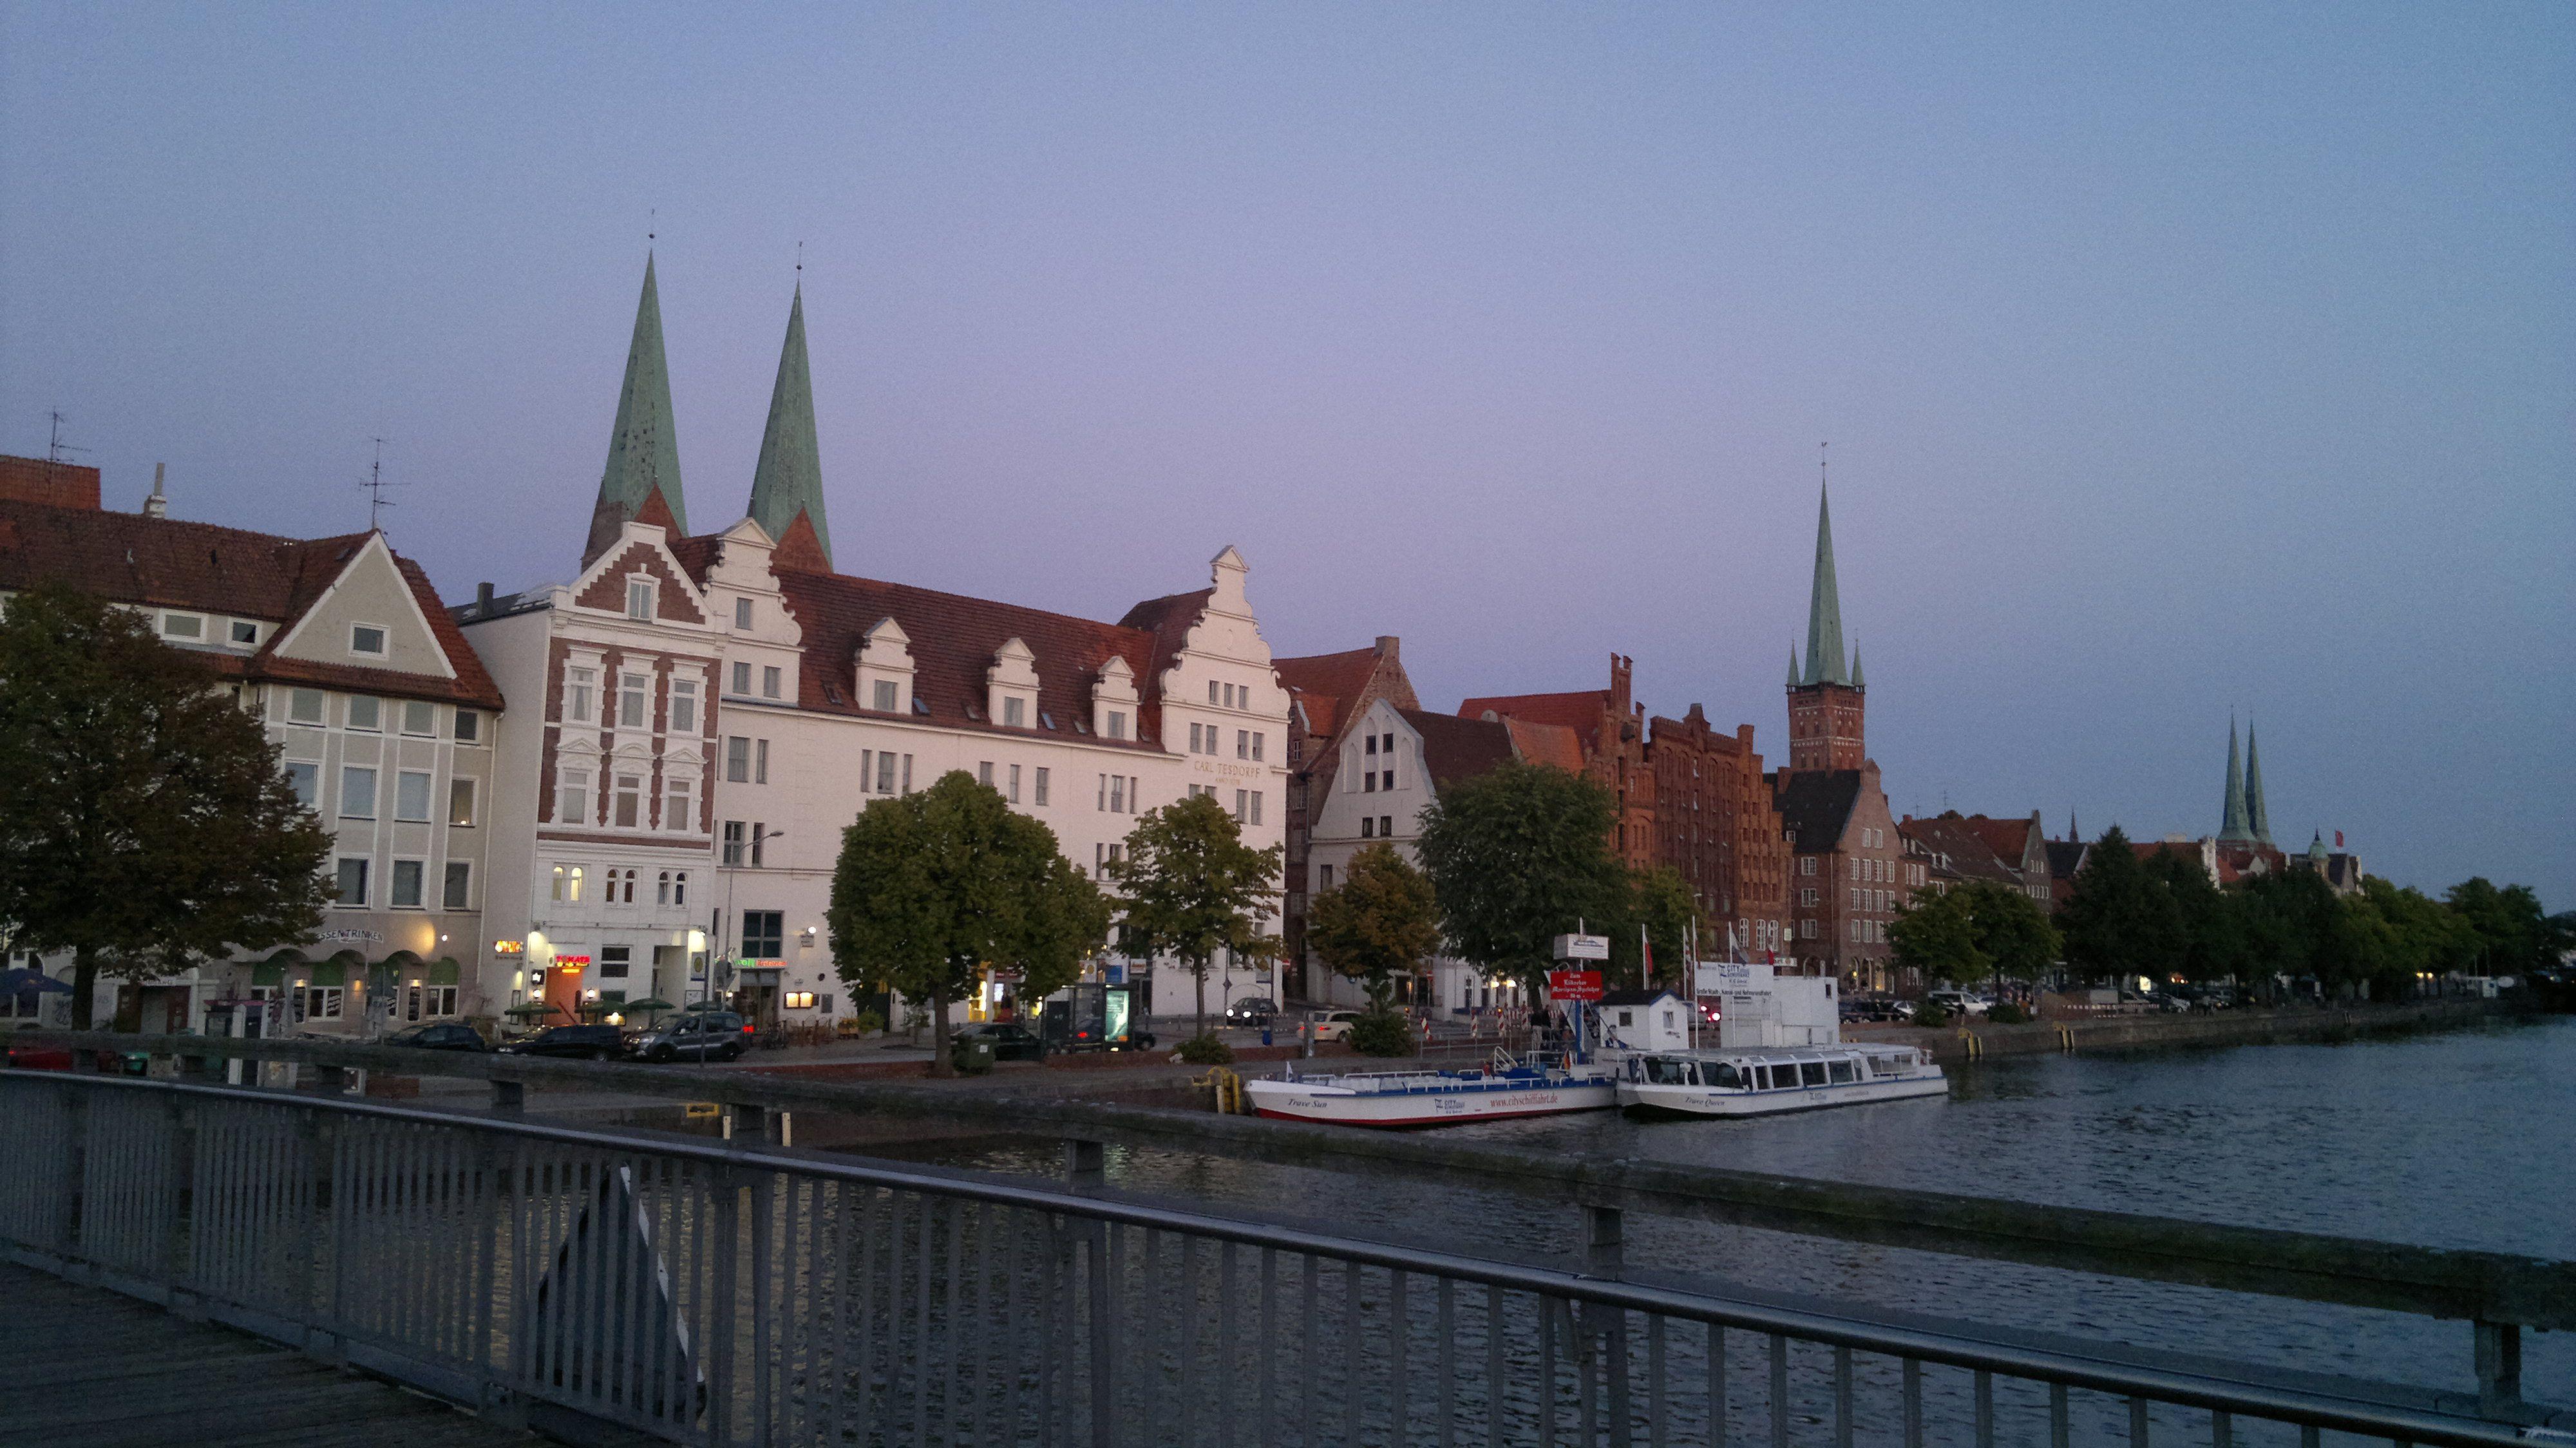 An der Untertrave, Lübeck, Germany Lübeck